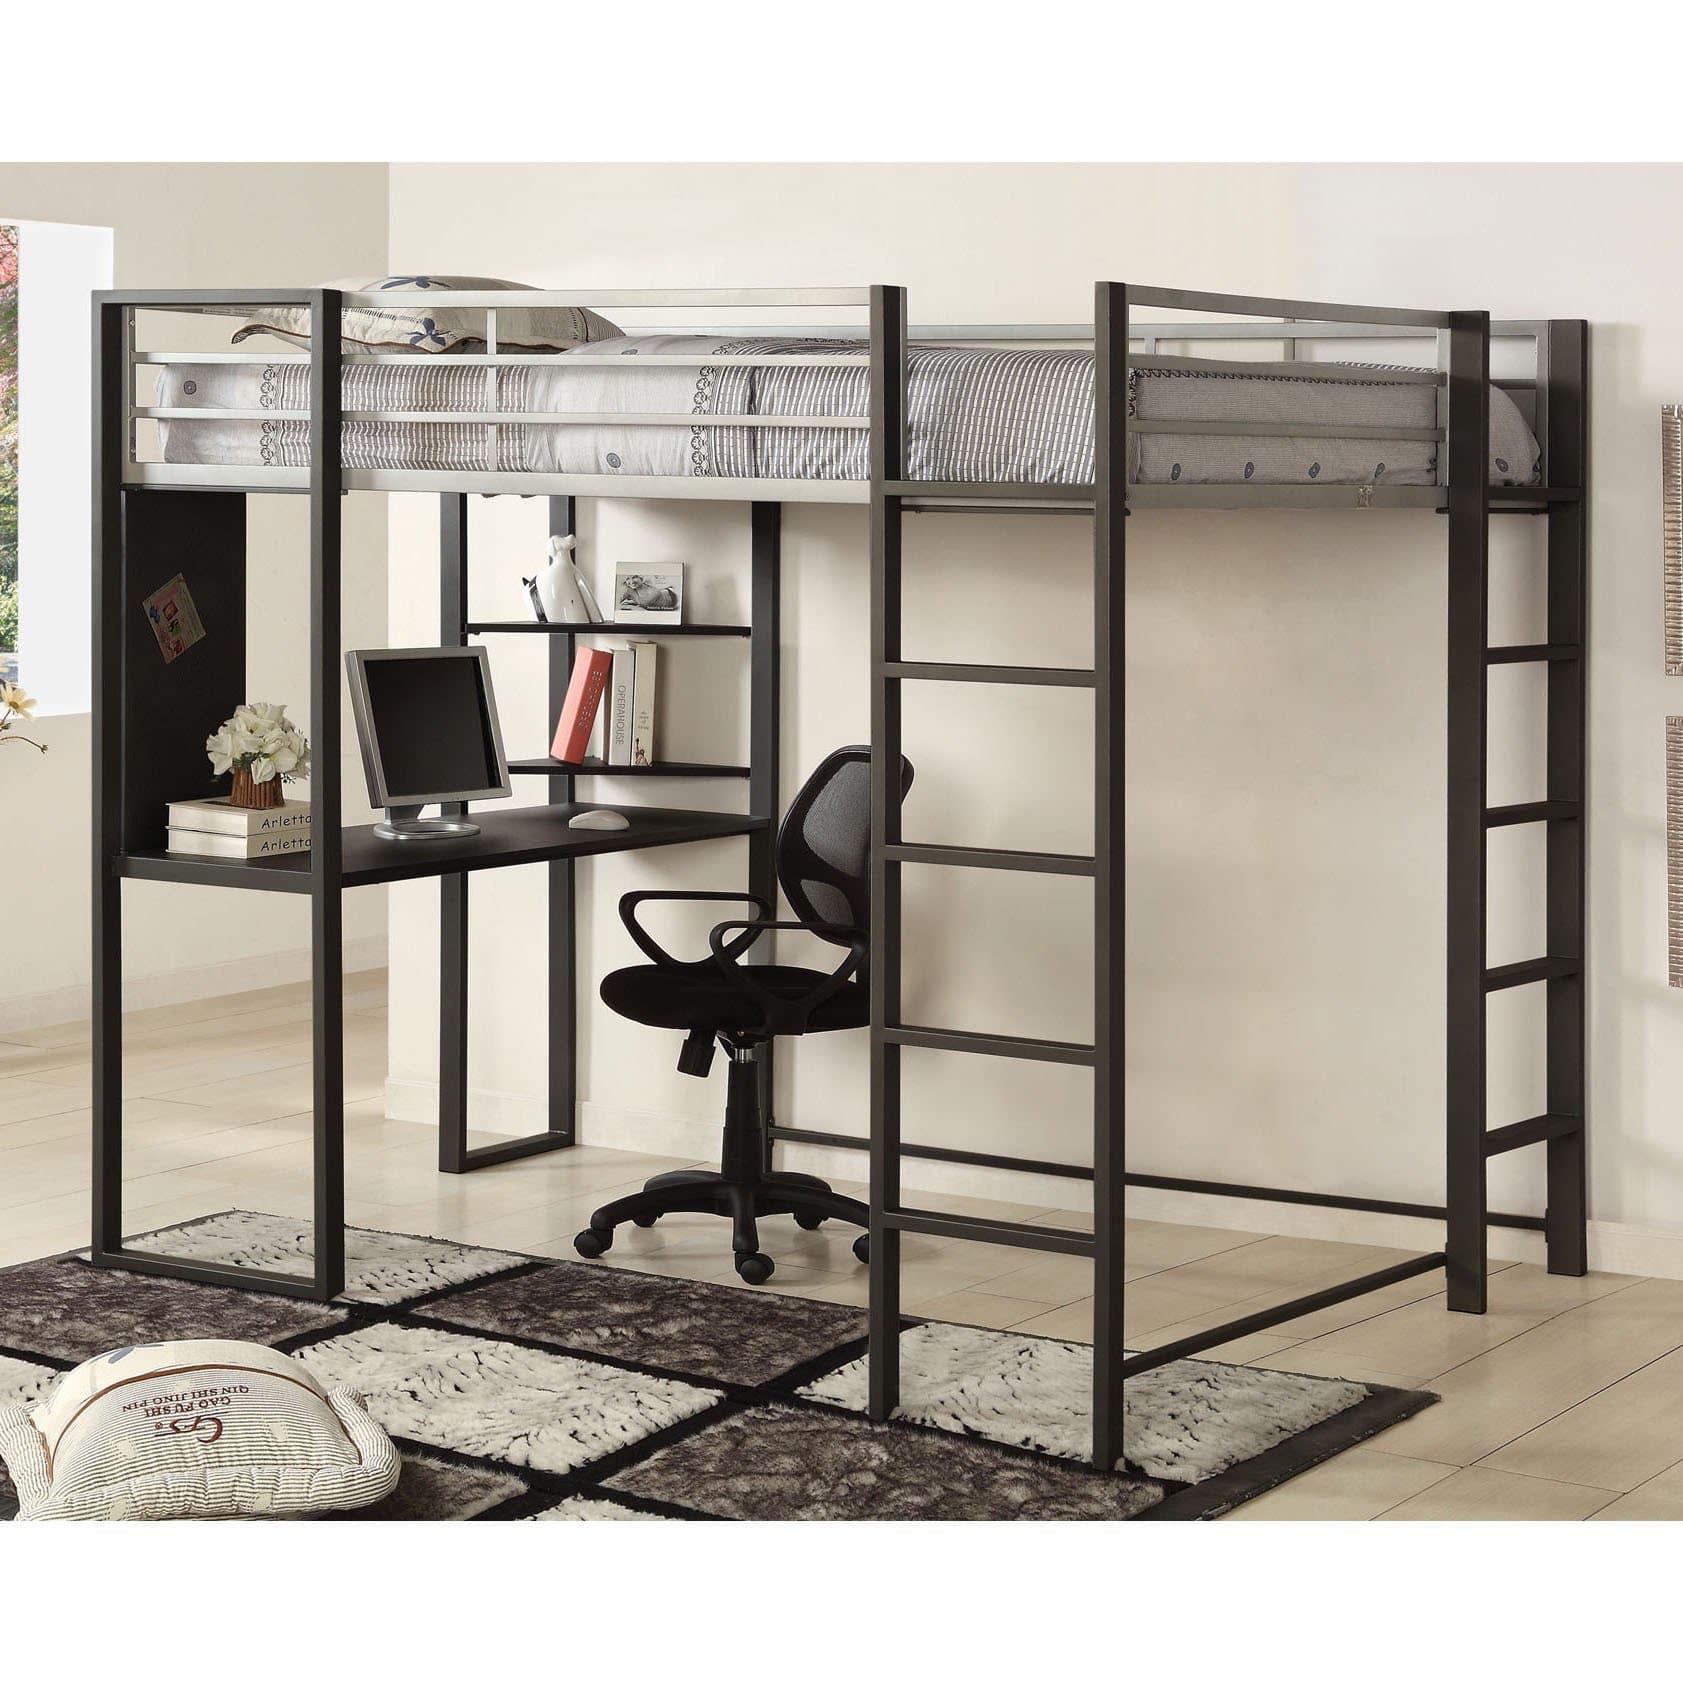 Furniture of America  Claremonte Silver/Grey Metal Workstation/Loft Bed